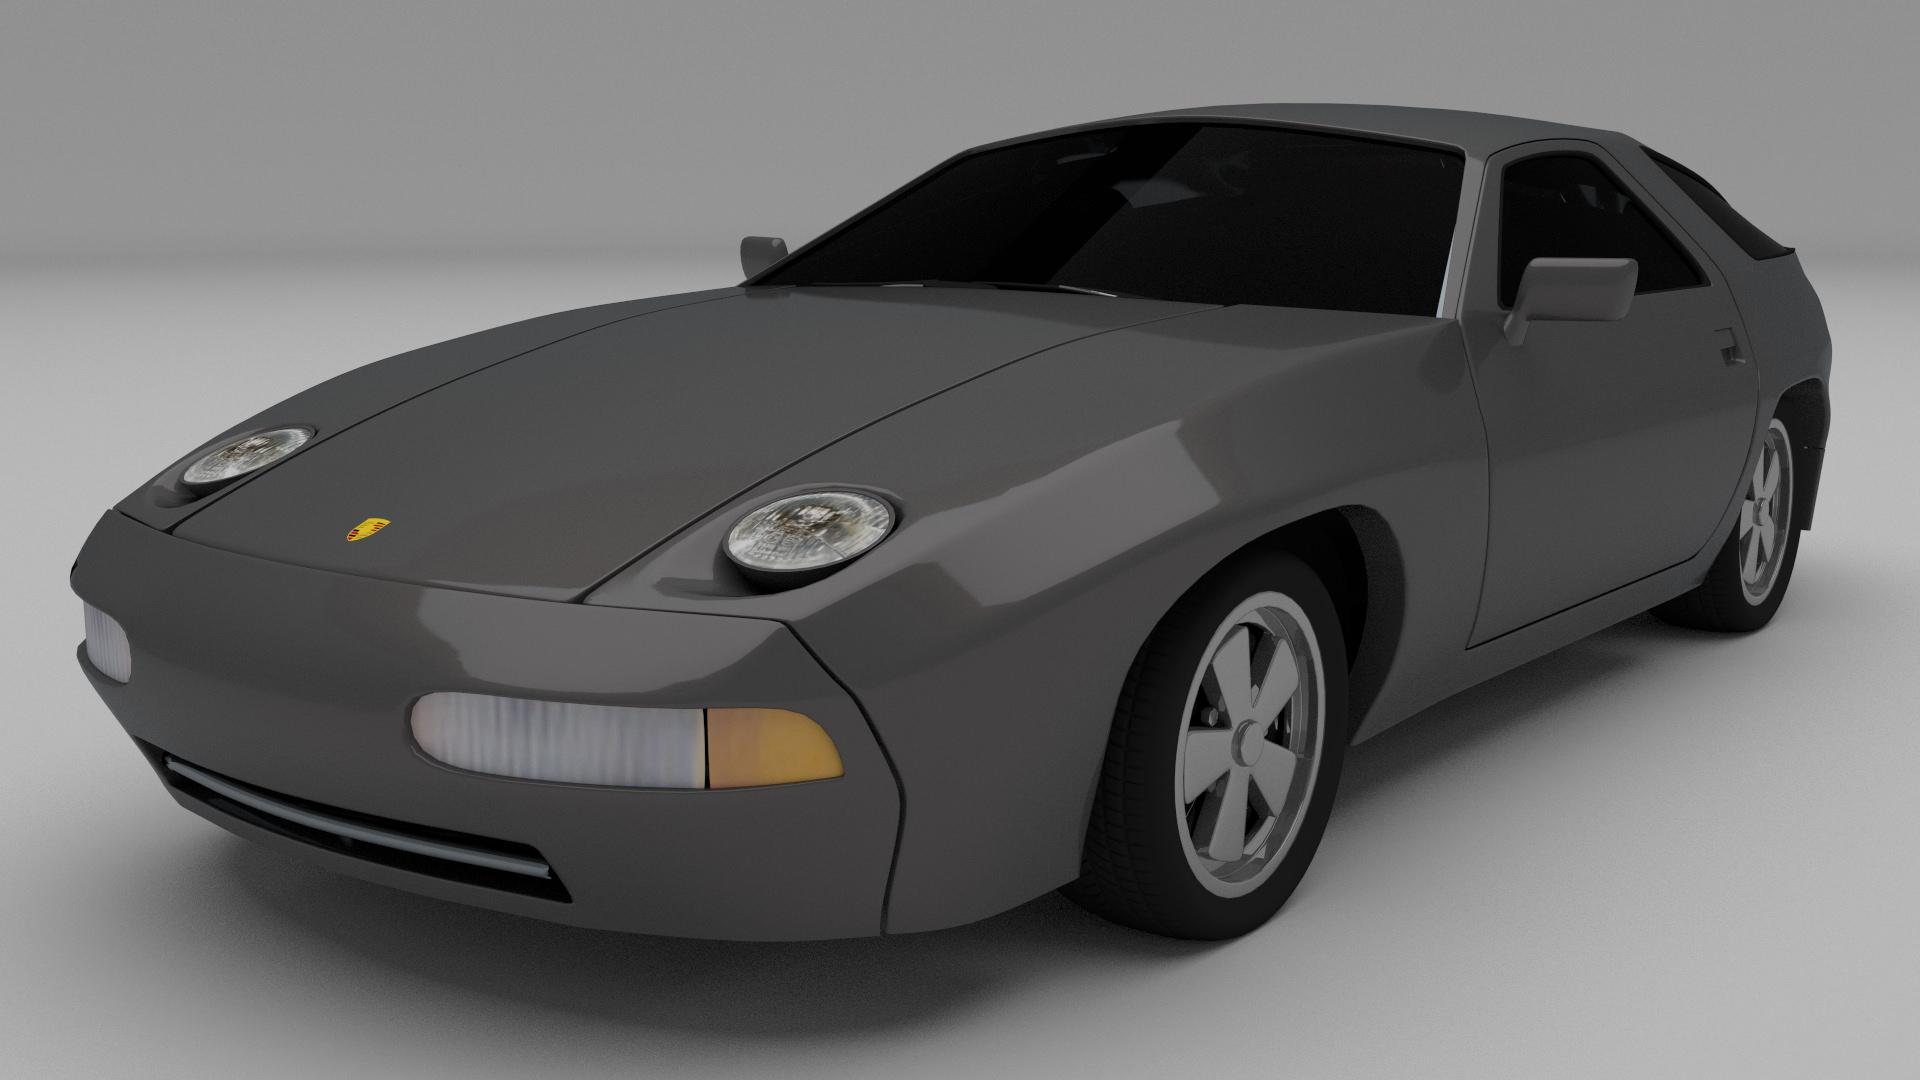 Porsche Classic Collection 3d Model Obj Stl Blend Dae Cgtrader Com